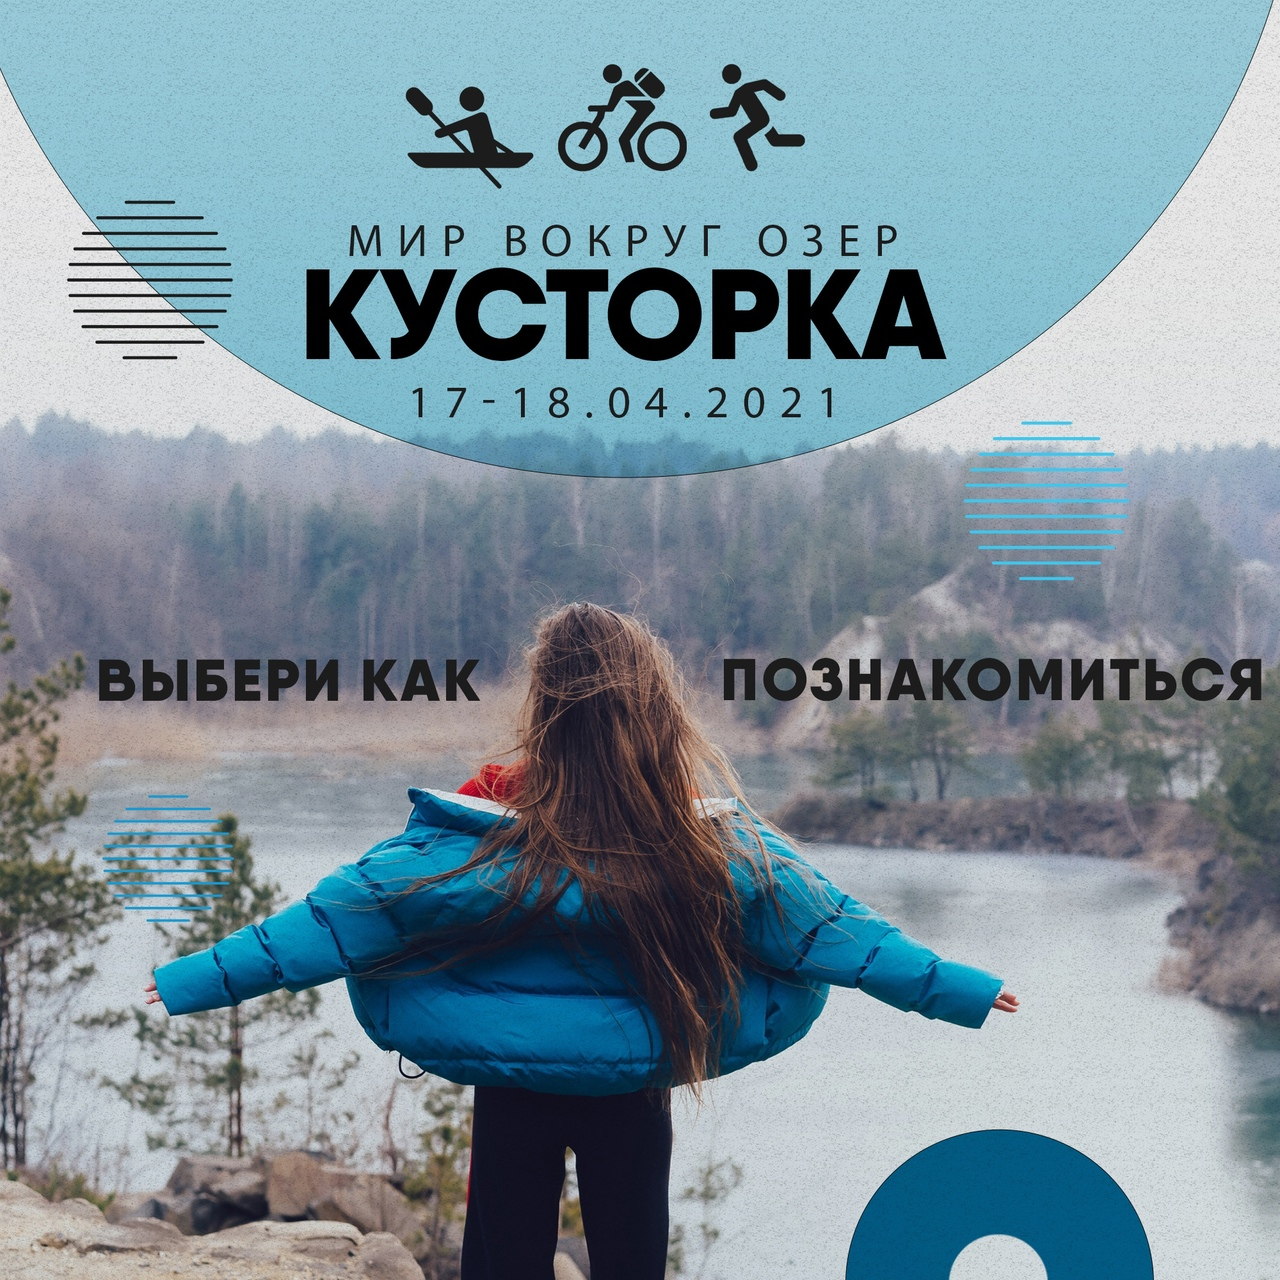 Афиша Нижний Новгород Мир вокруг озёр - Кусторка